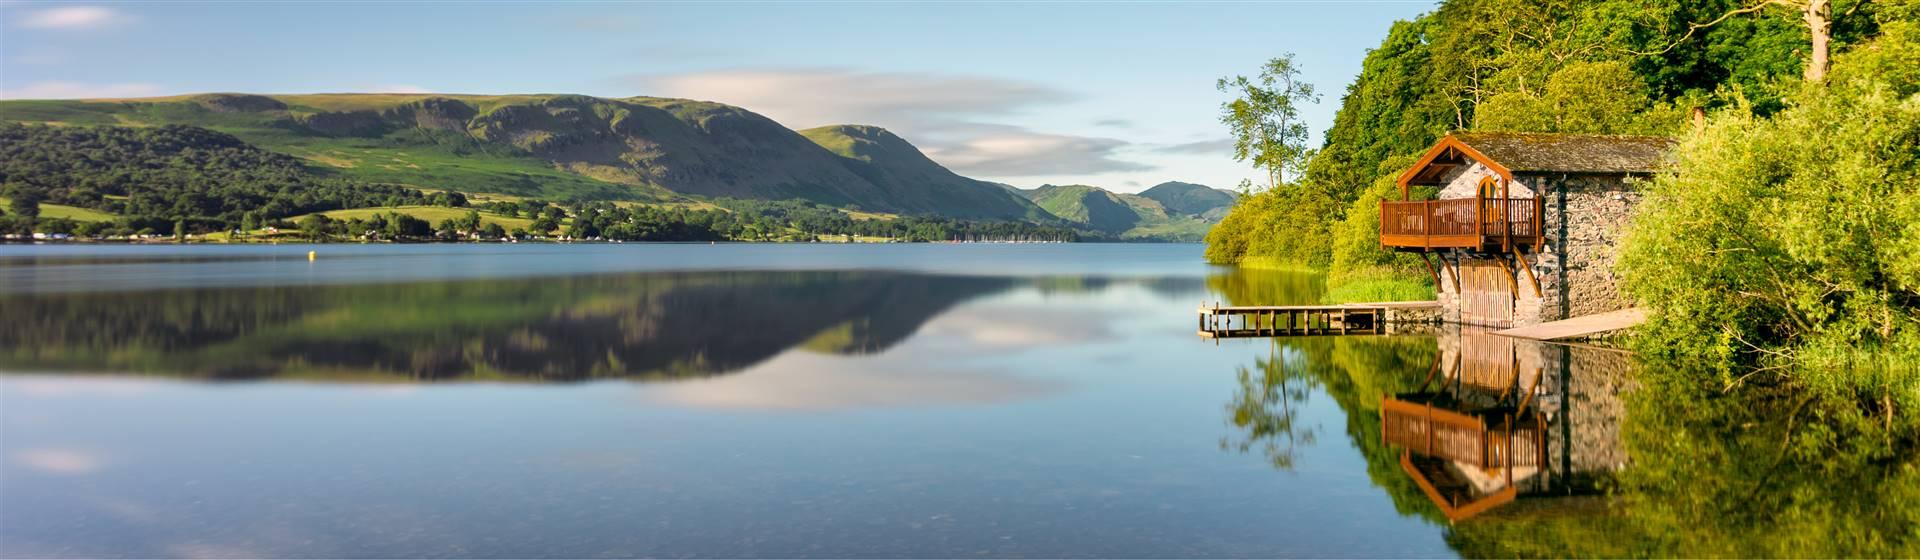 Ullswater in Cumbria's Lake District